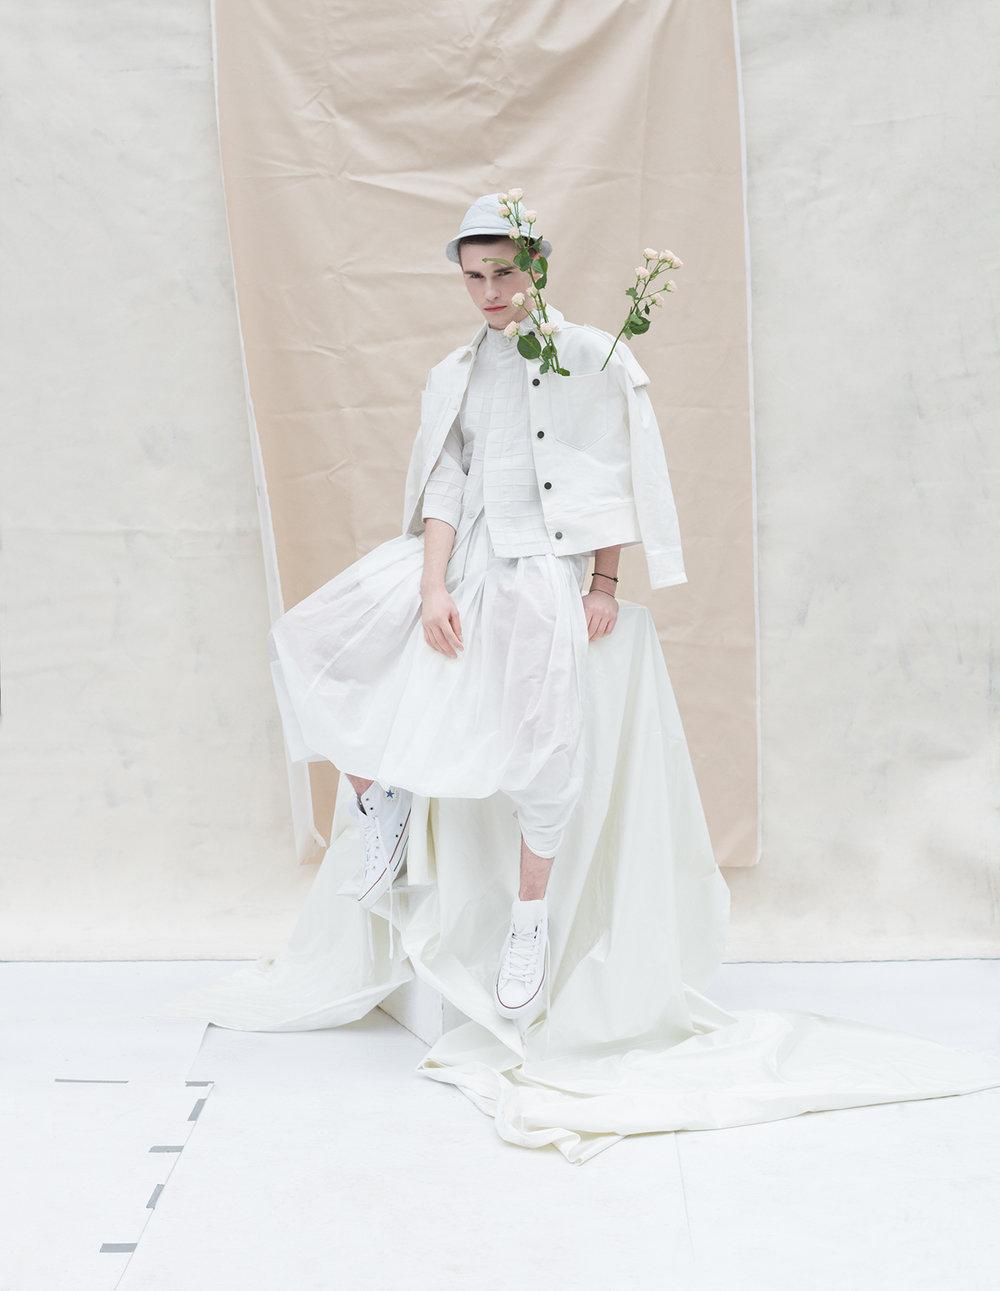 KMAG - Marcela Stańczy / Romek Gelo